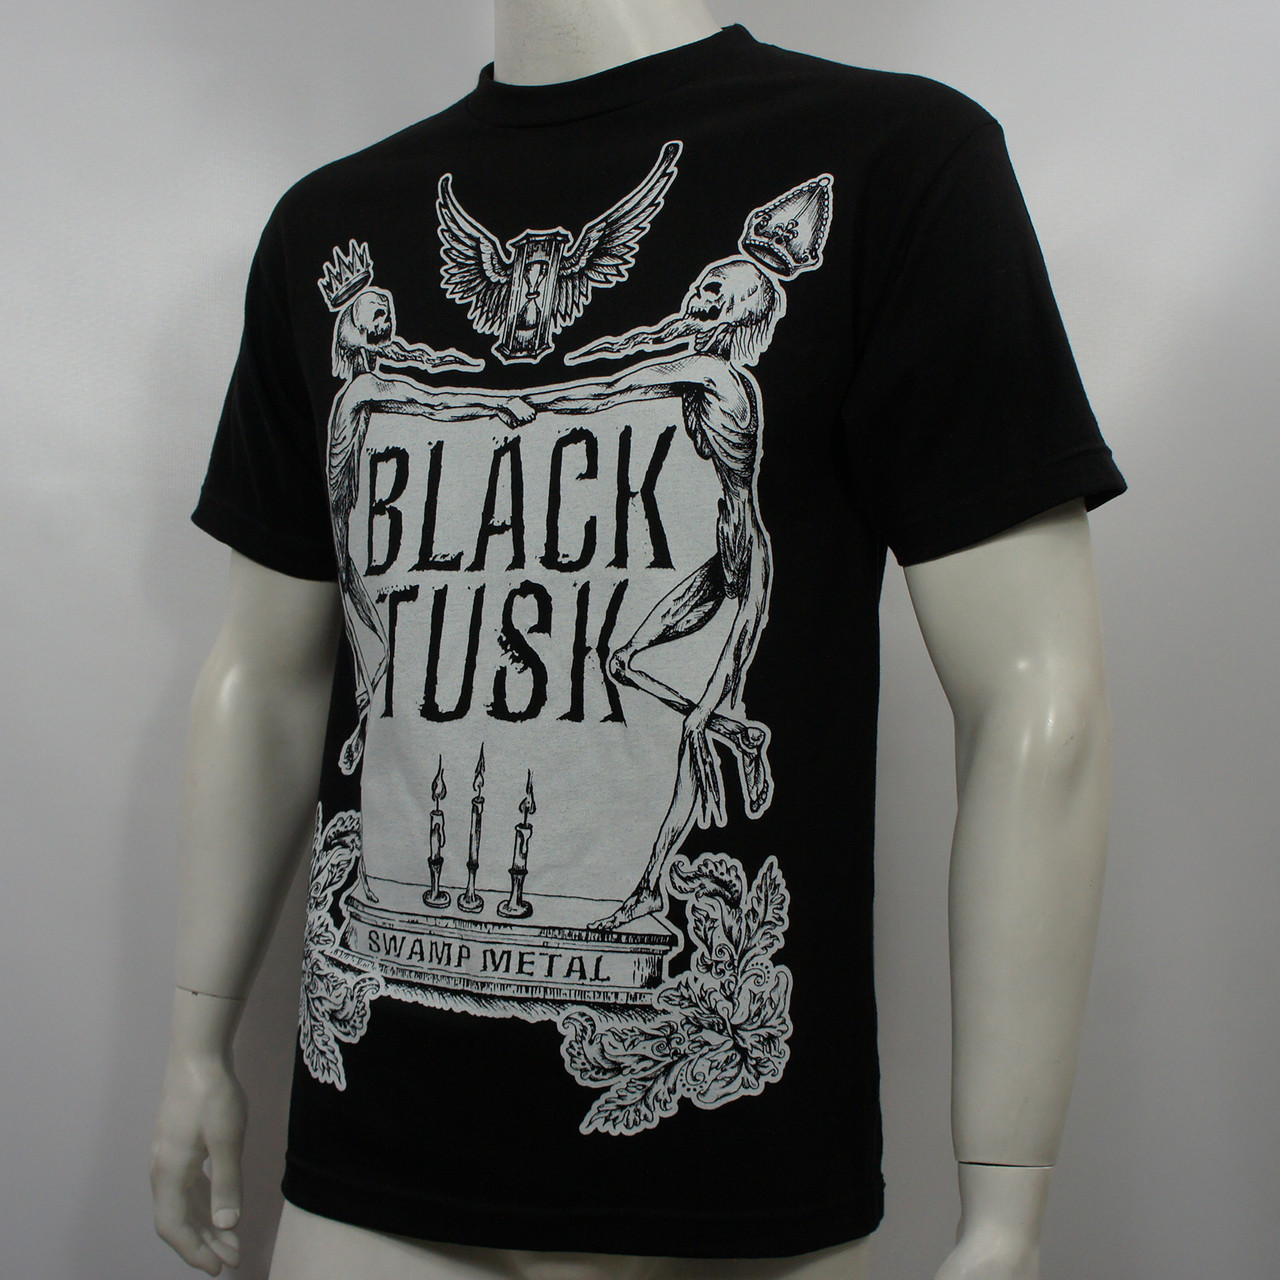 http://d3d71ba2asa5oz.cloudfront.net/12013655/images/30419-black-tusk-altar-t-shirt-black-(3).jpg